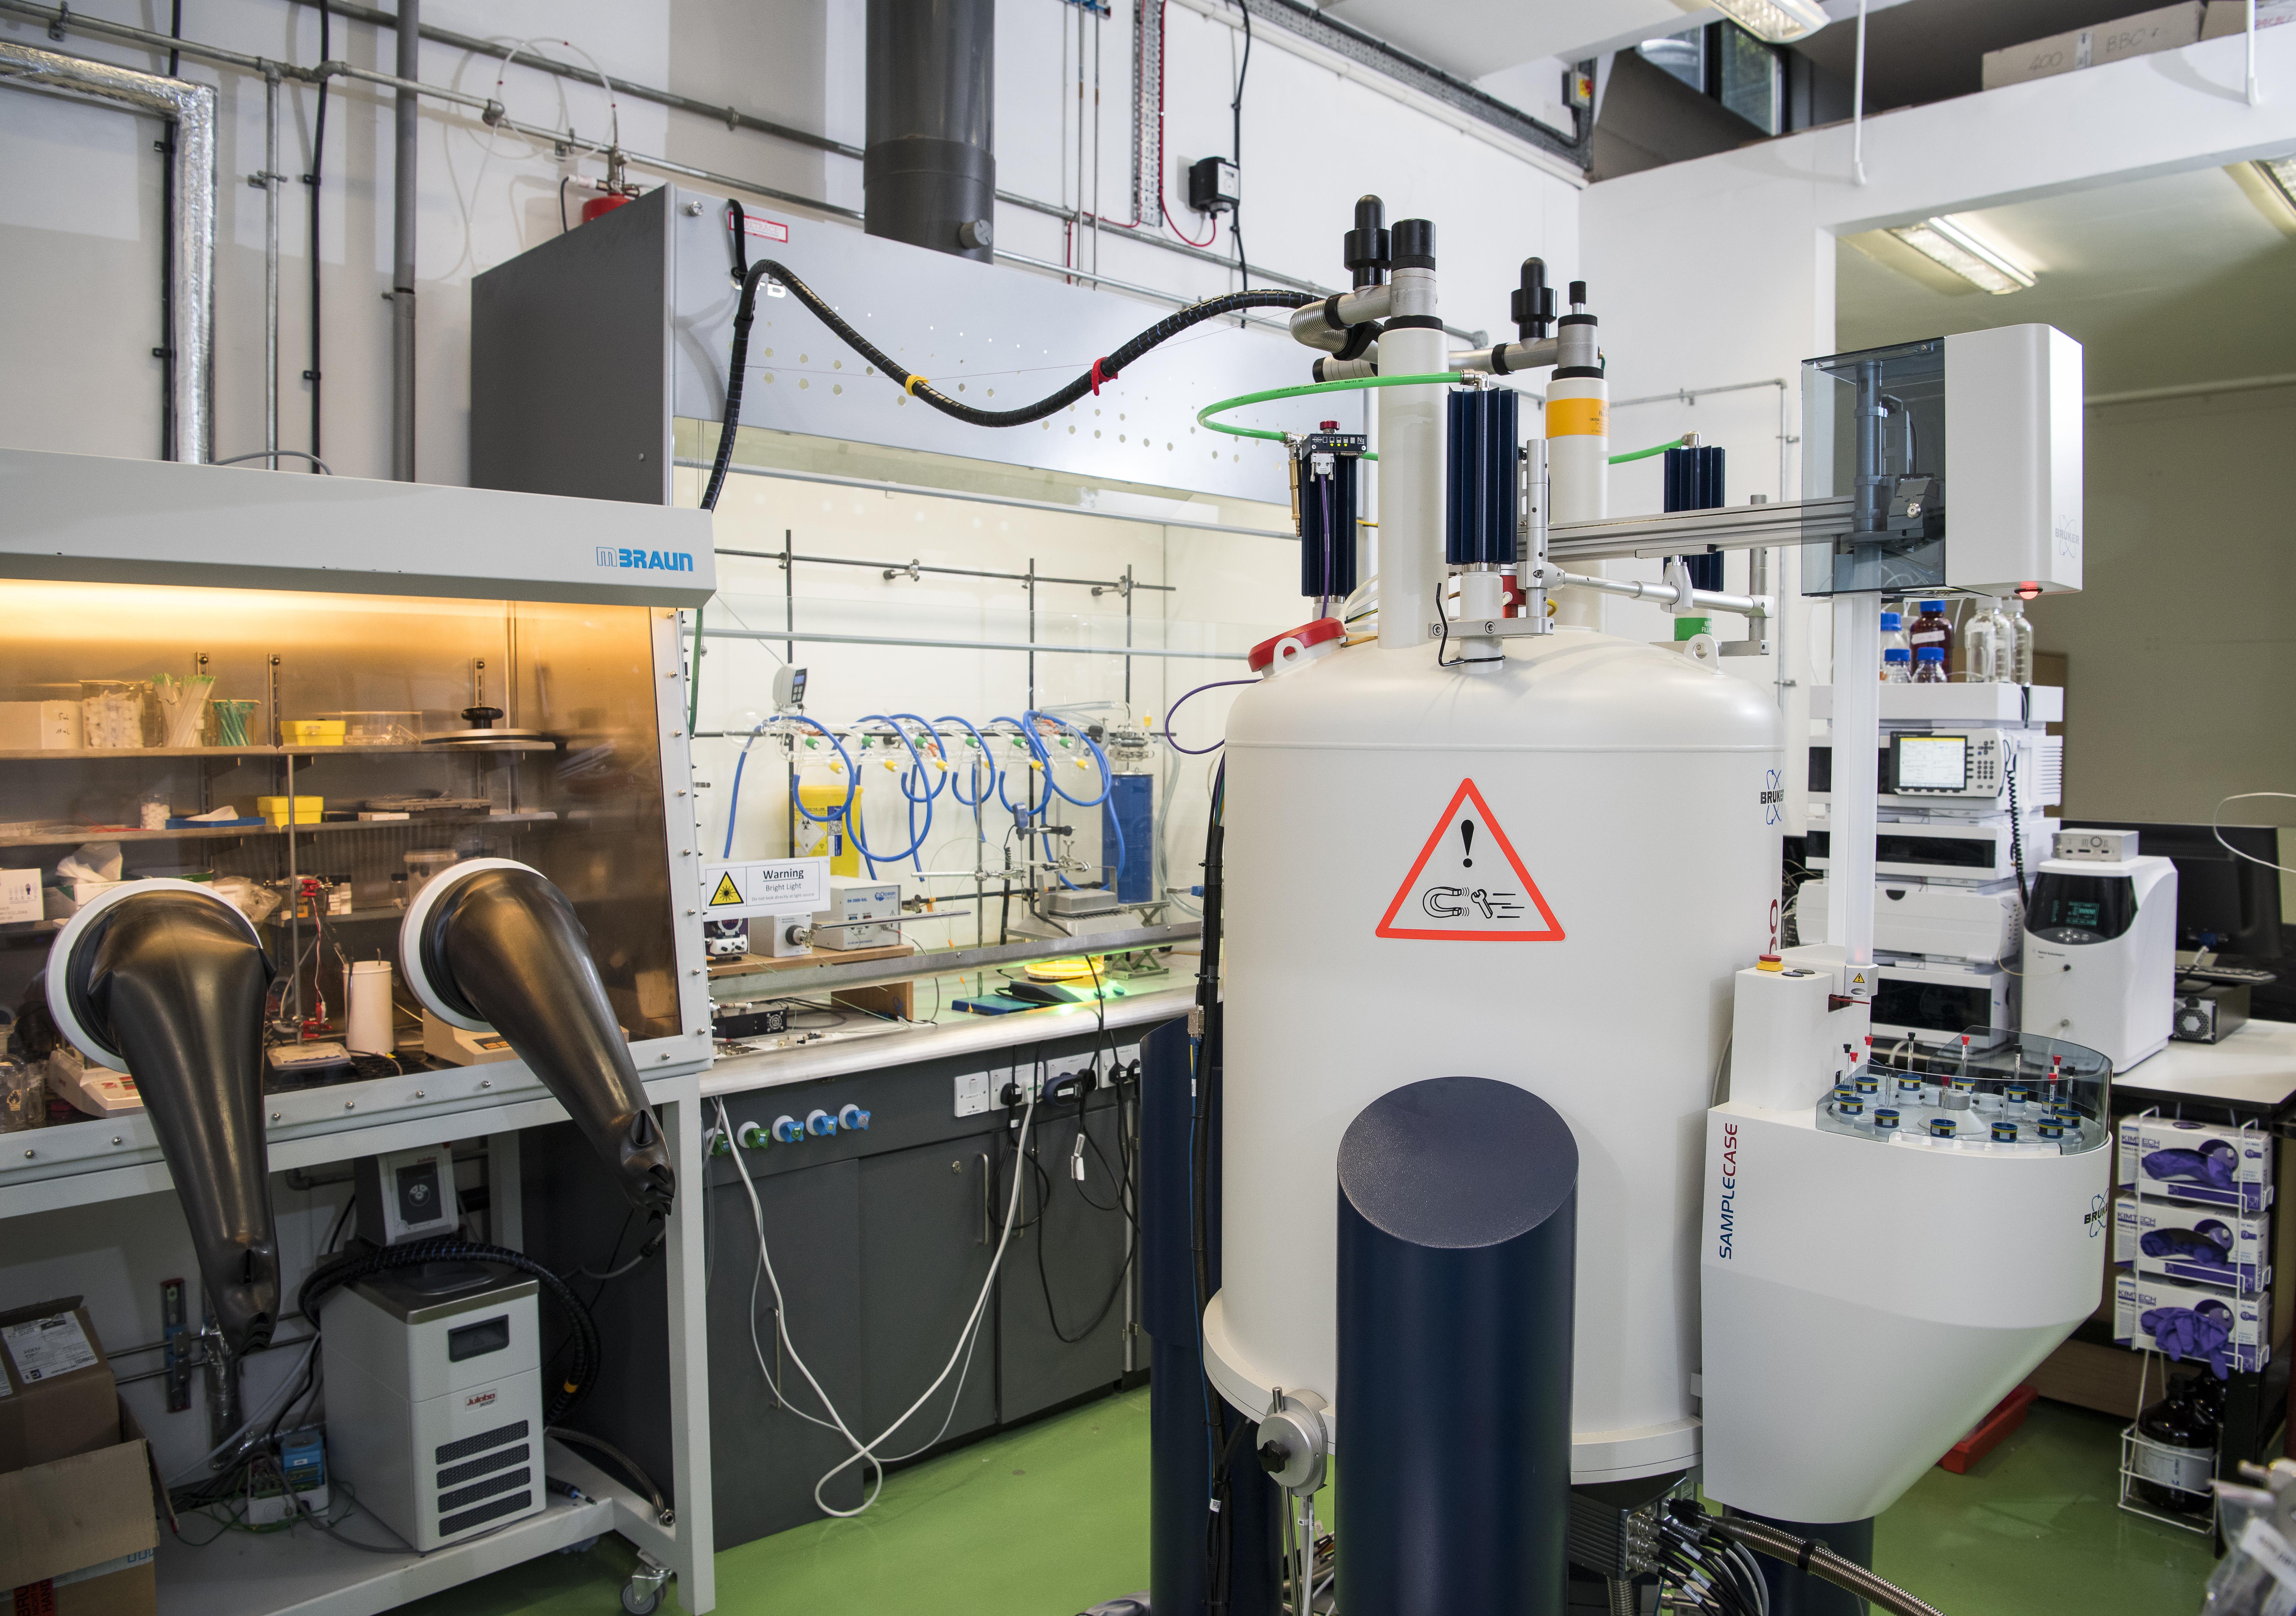 NMR spectrometer